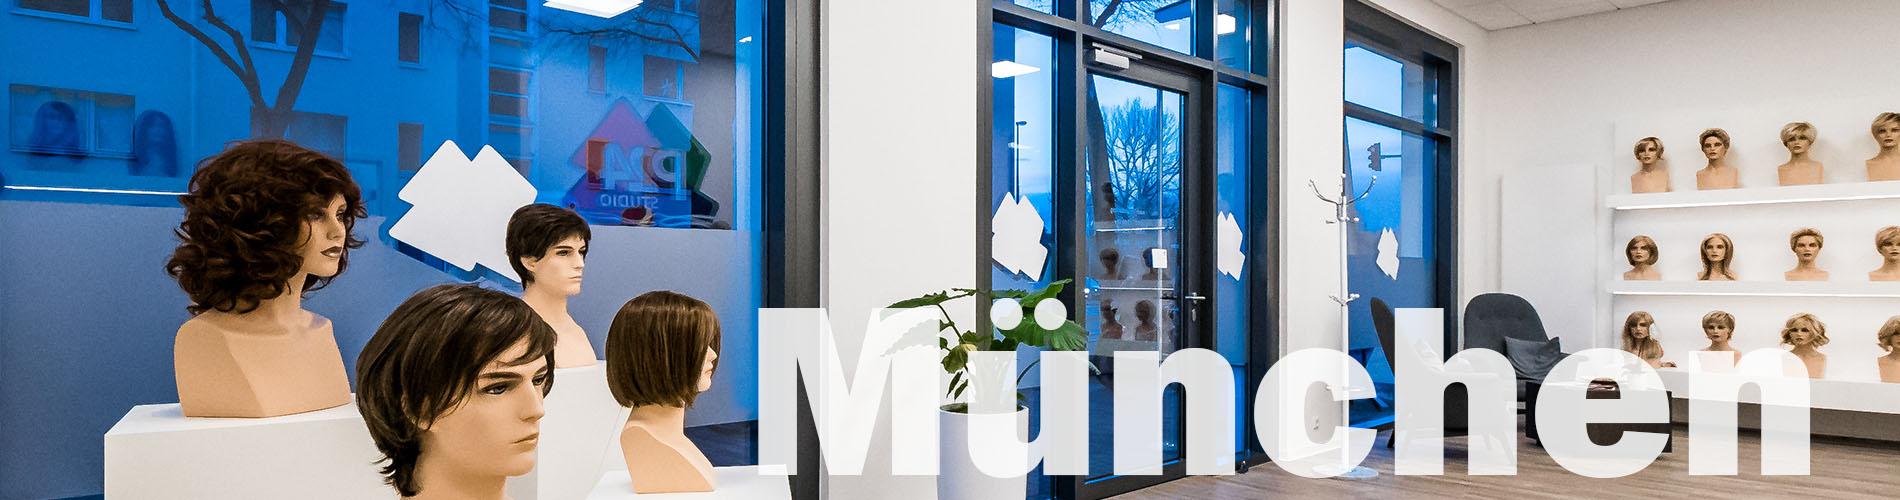 P24 Studio München